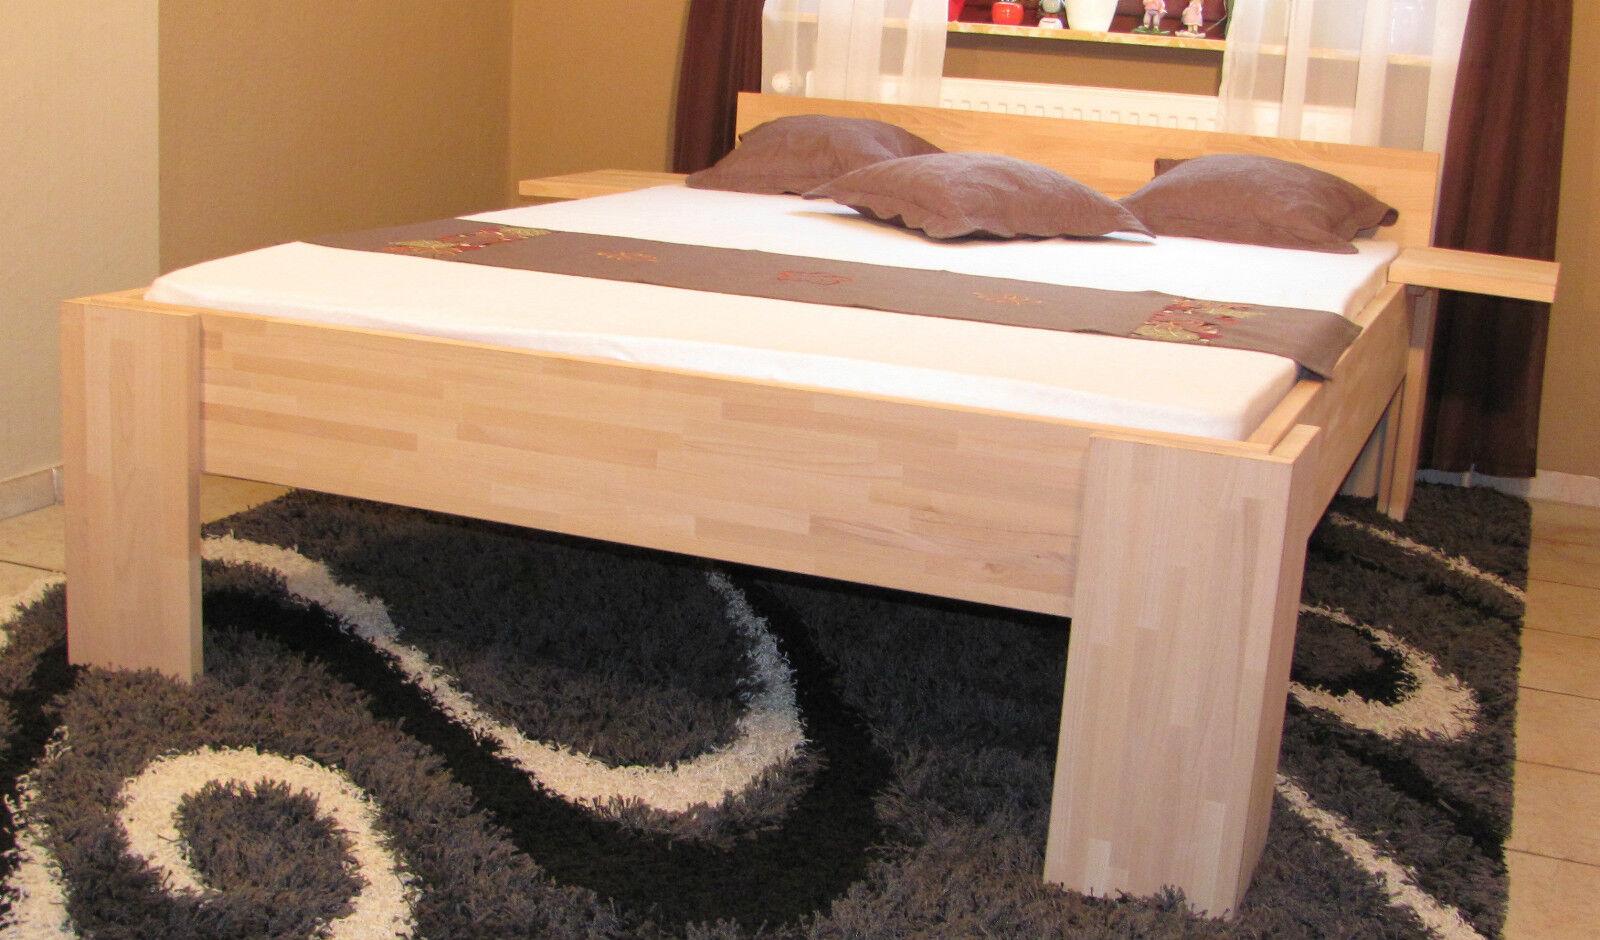 massivholzbett holzbett 140x200 fu i doppelbett massiv g stebett buche bett eur 169 00. Black Bedroom Furniture Sets. Home Design Ideas